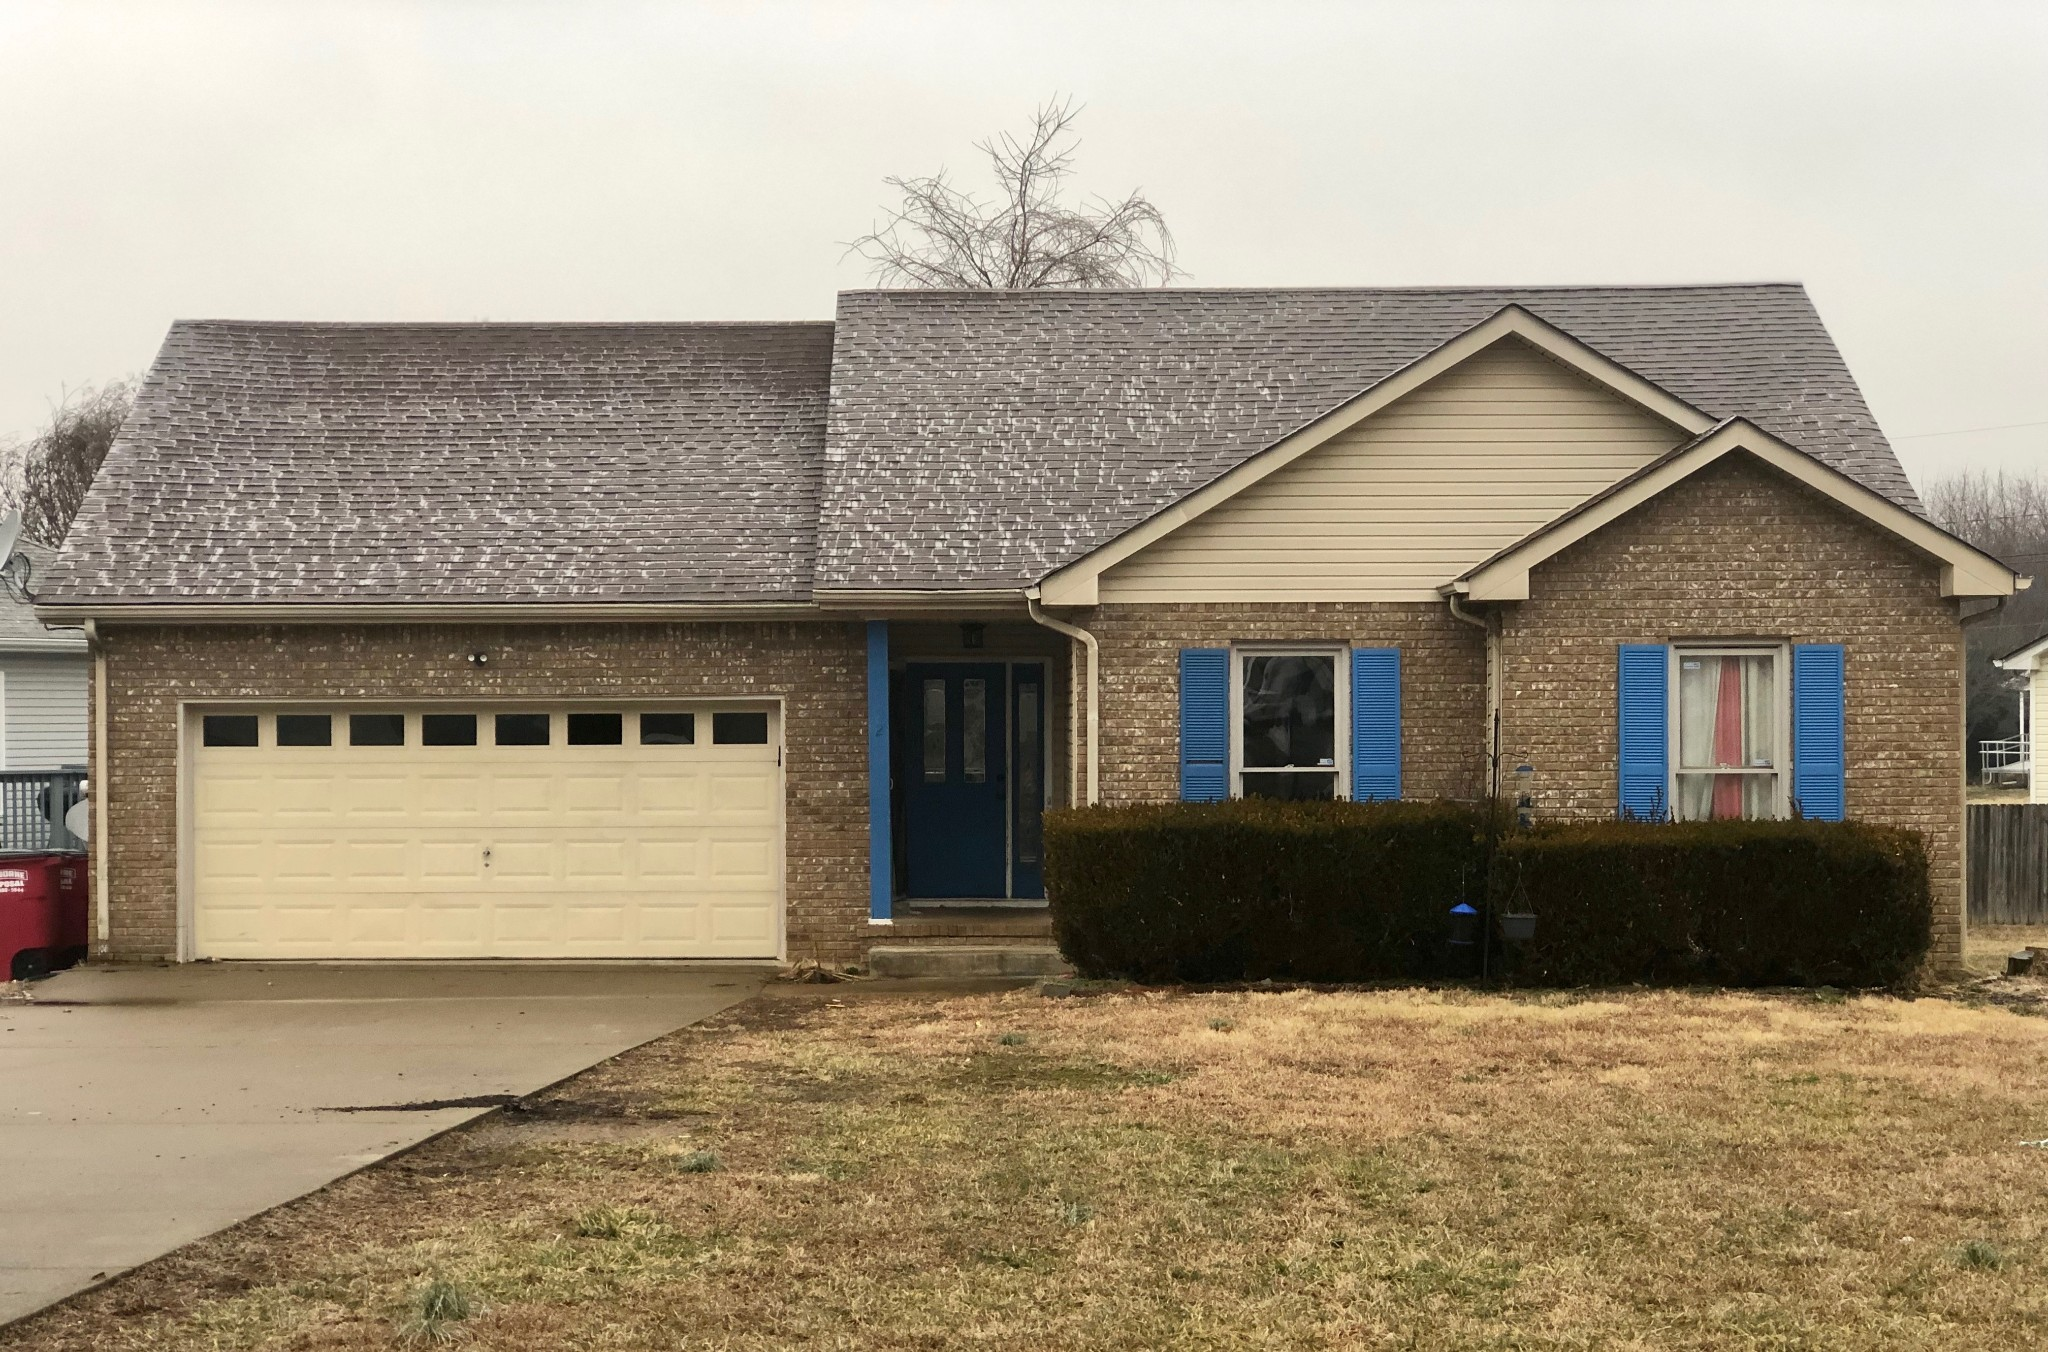 3205 S Senseney Cir Property Photo - Clarksville, TN real estate listing